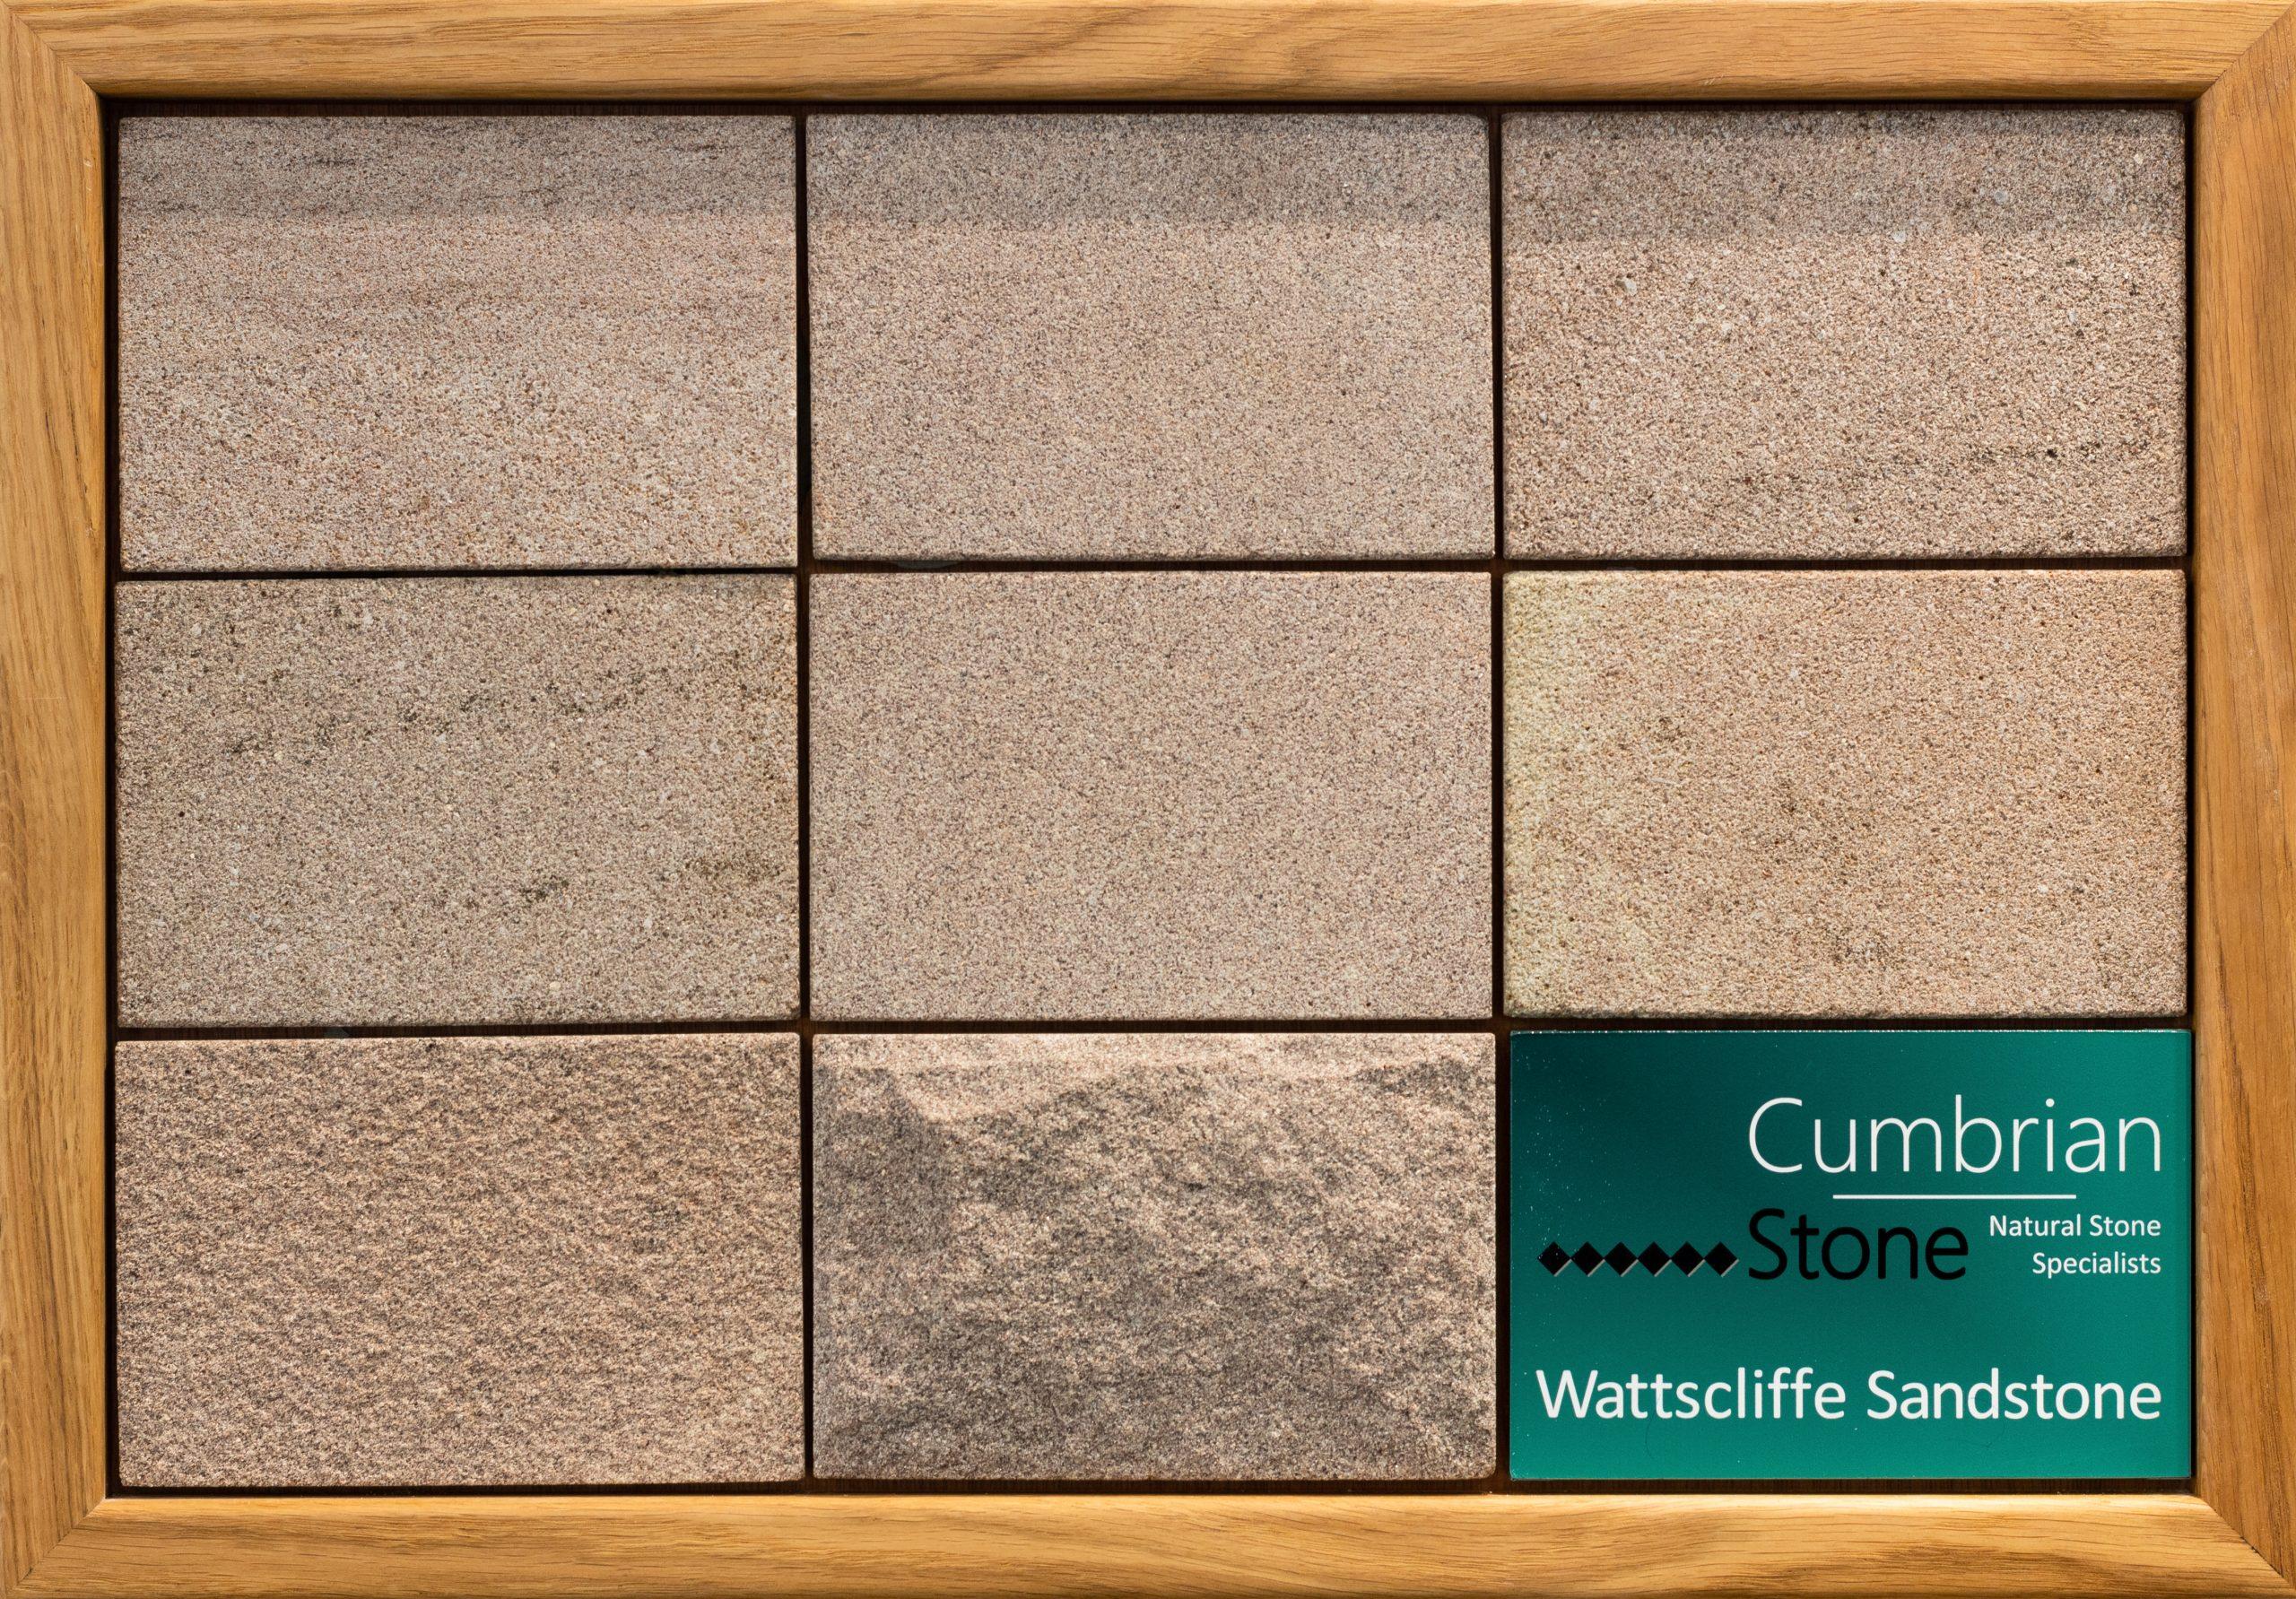 Wattscliffe Sandstone Variations